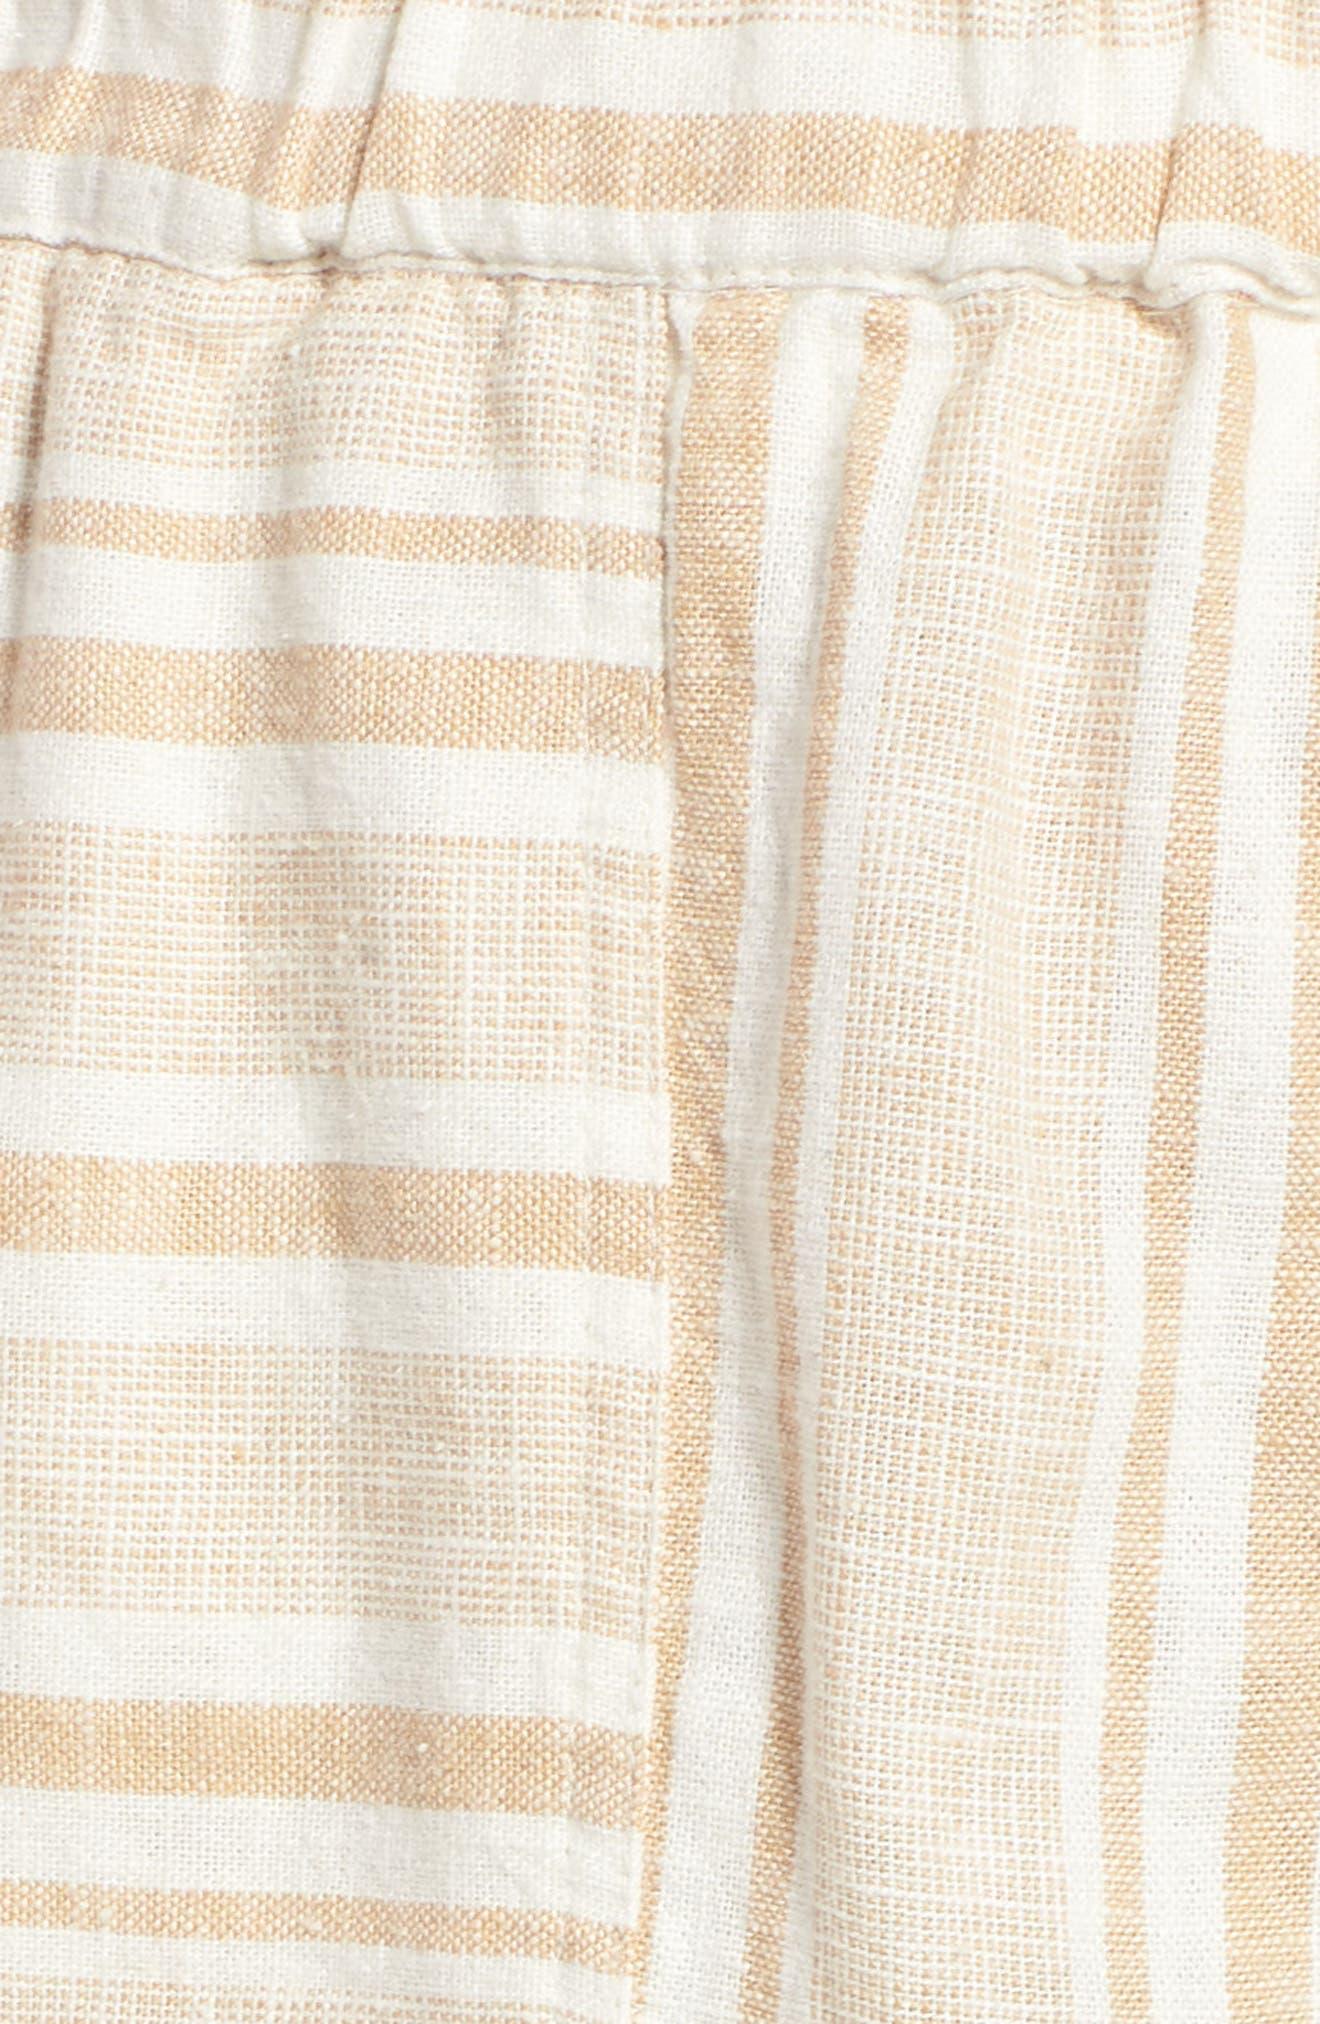 Stripe Linen Blend Shorts,                             Alternate thumbnail 5, color,                             Tan Lark Viola Stripe